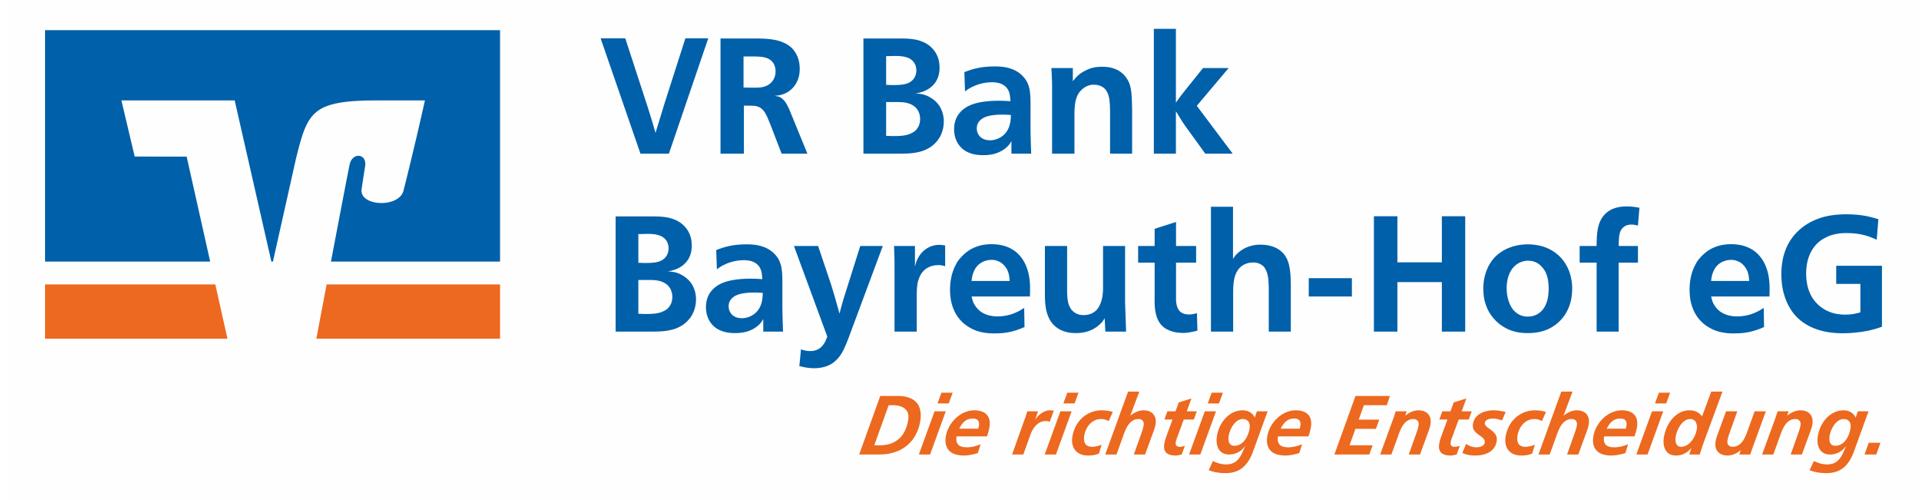 VR Bank Bayreuth-Hof eG Filiale Schwarzenbach an der Saale